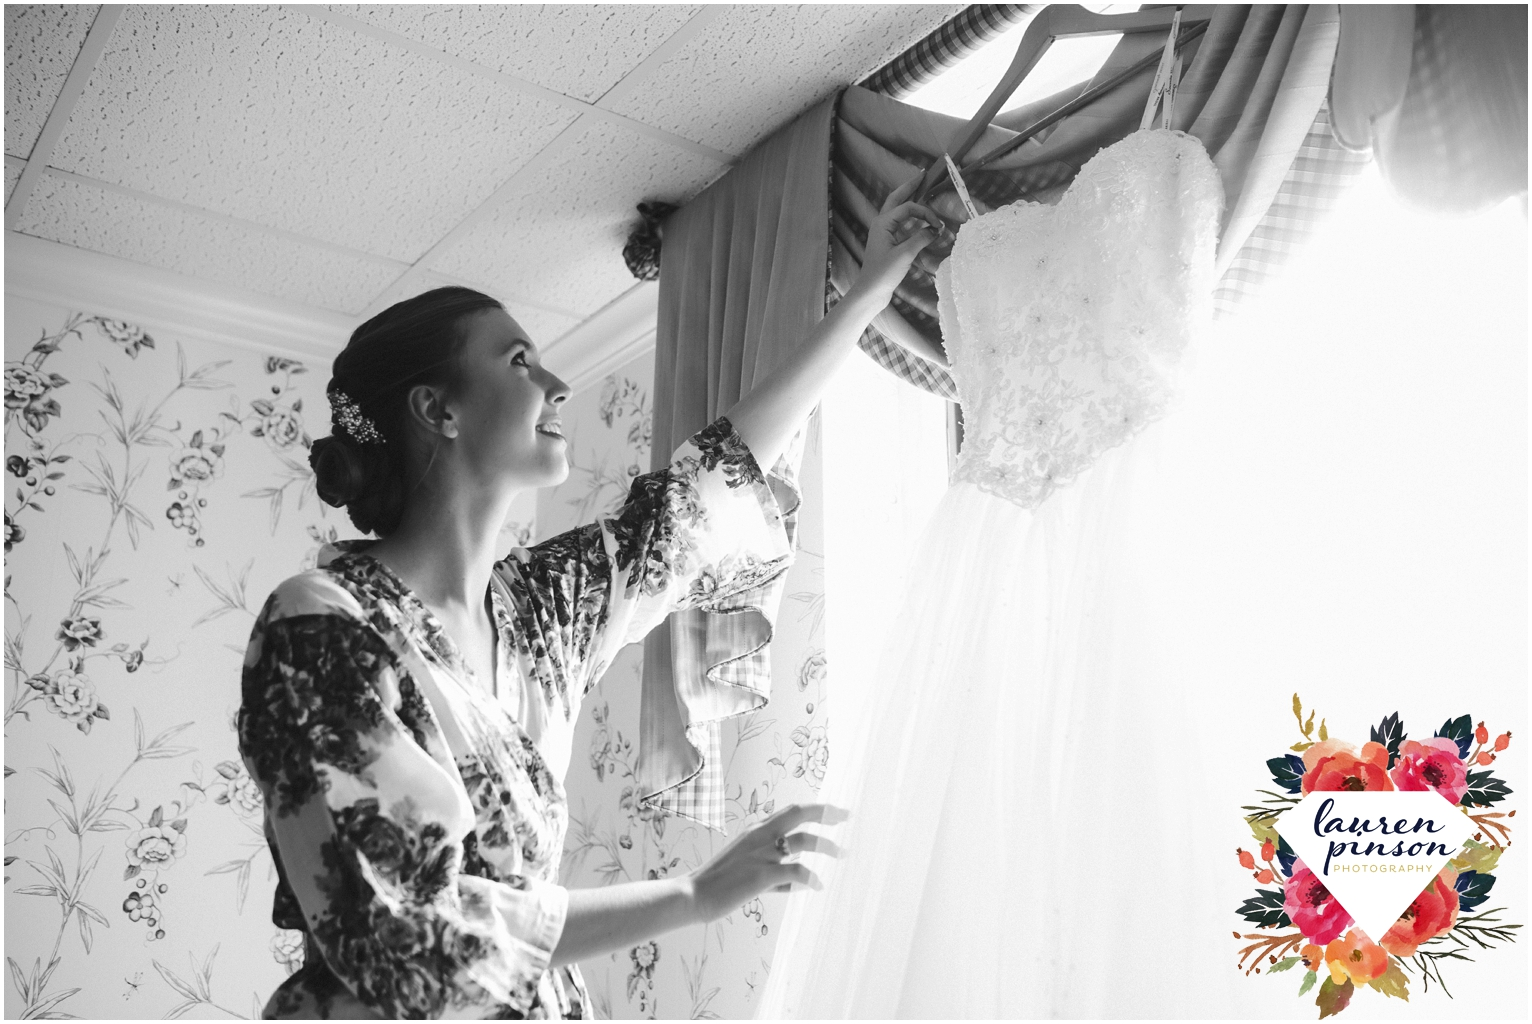 wichita-falls-wedding-photography-at-fain-presbyterian-church-and-the-wellington-timeless-classic-modern-photographer_1117.jpg